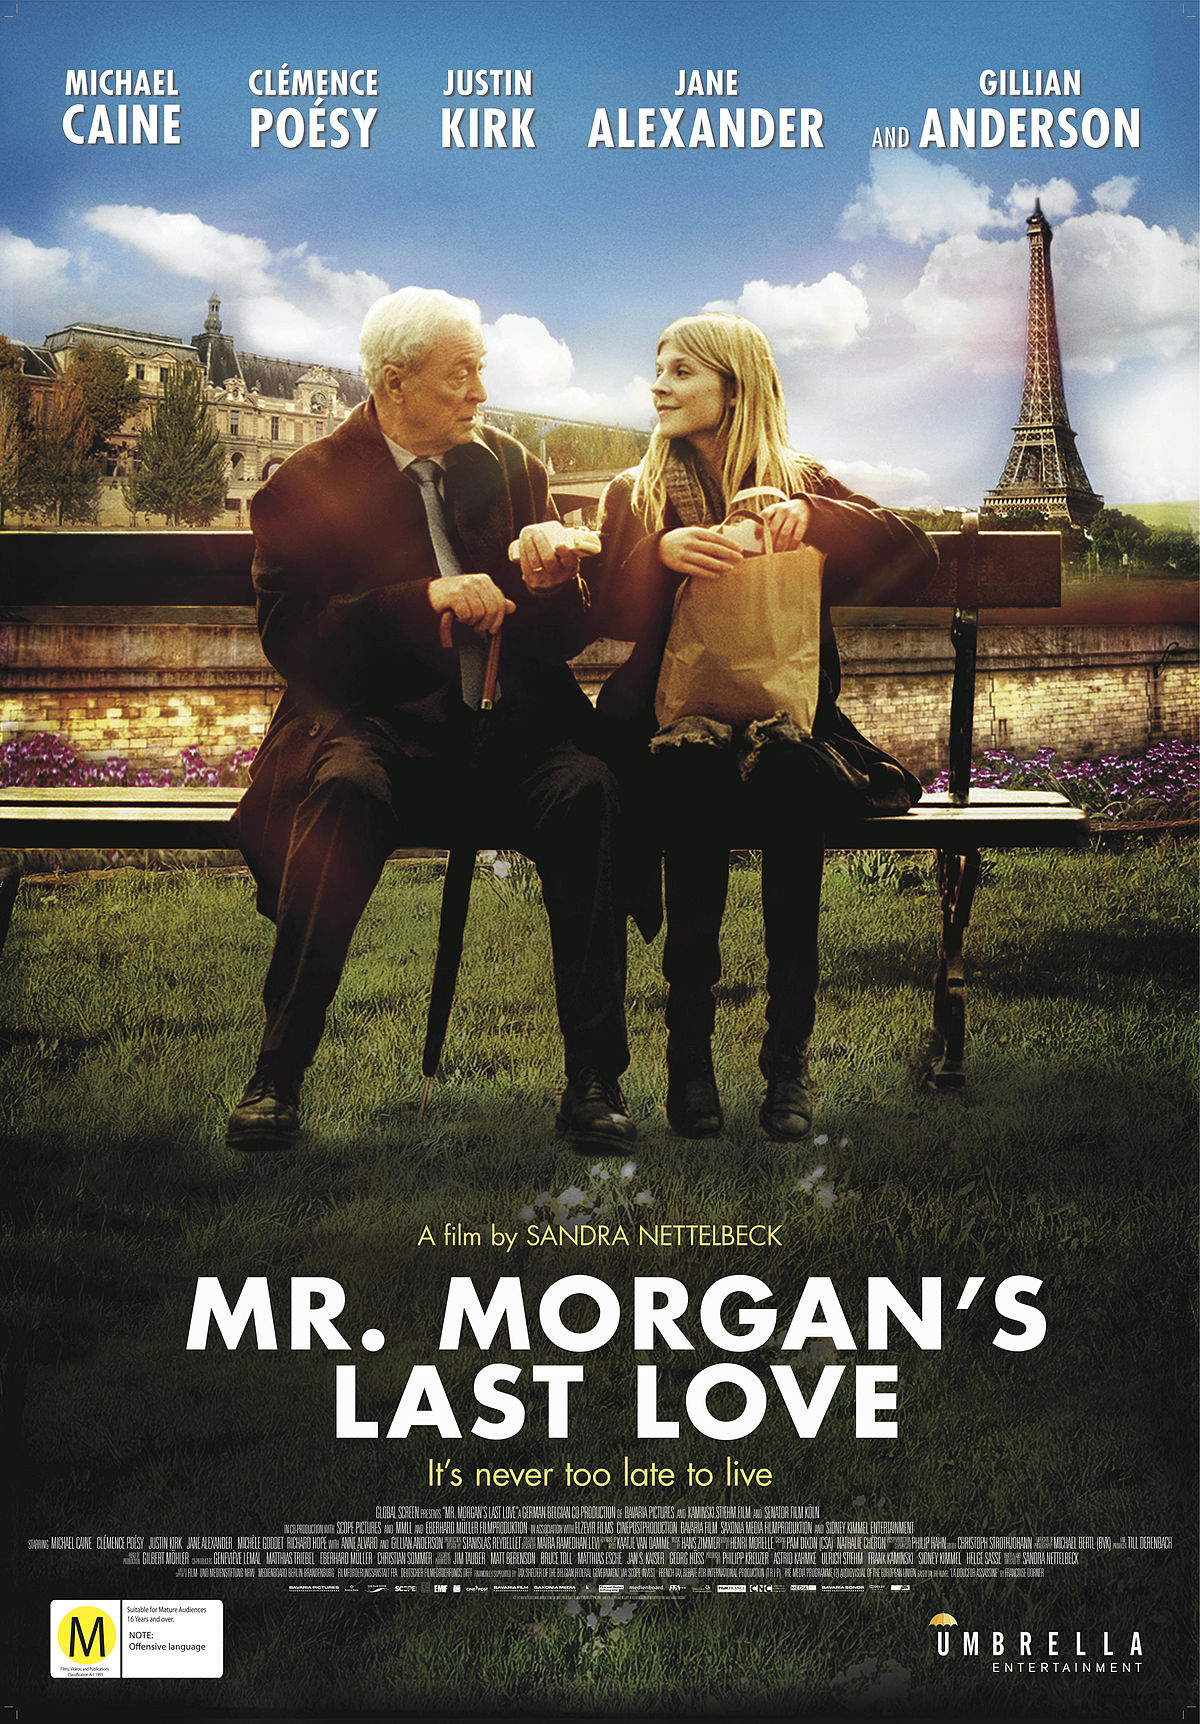 Mr. Morgan's Last Love - Wikipedia bahasa Indonesia